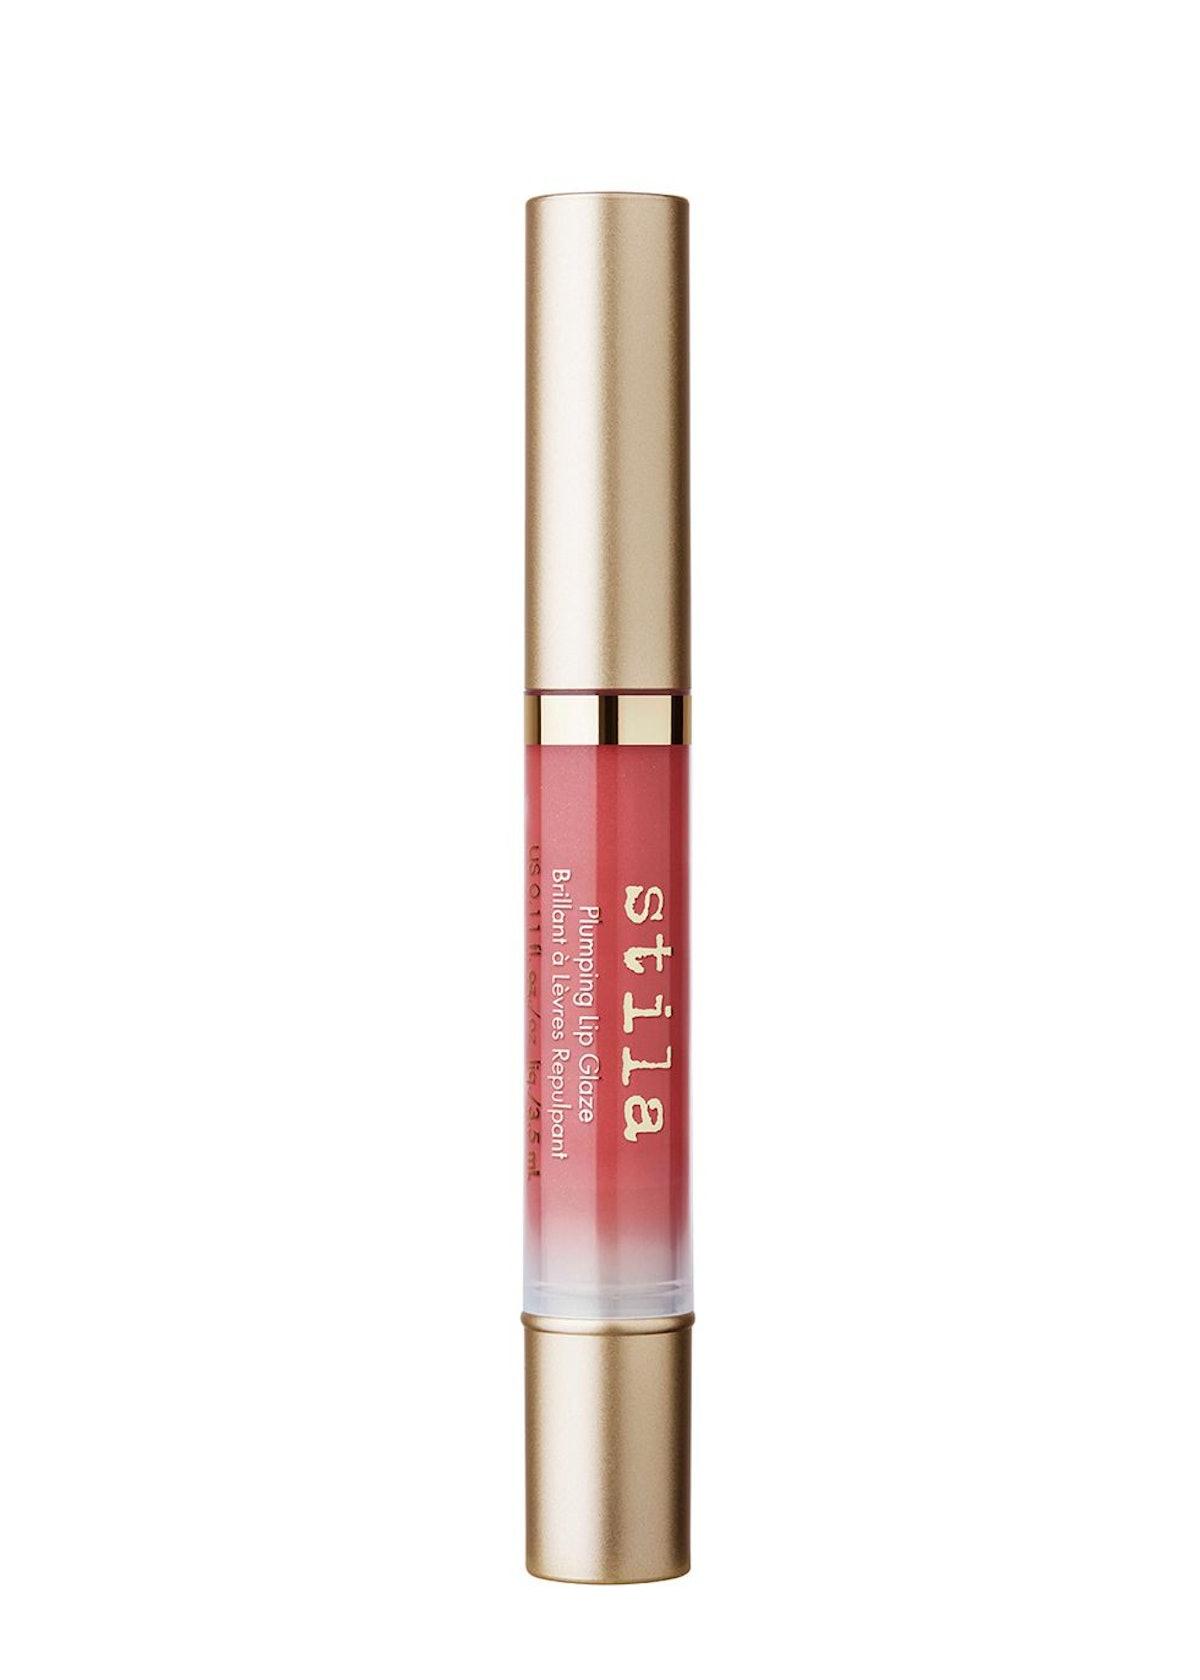 Plumping Lip Glaze: additional image